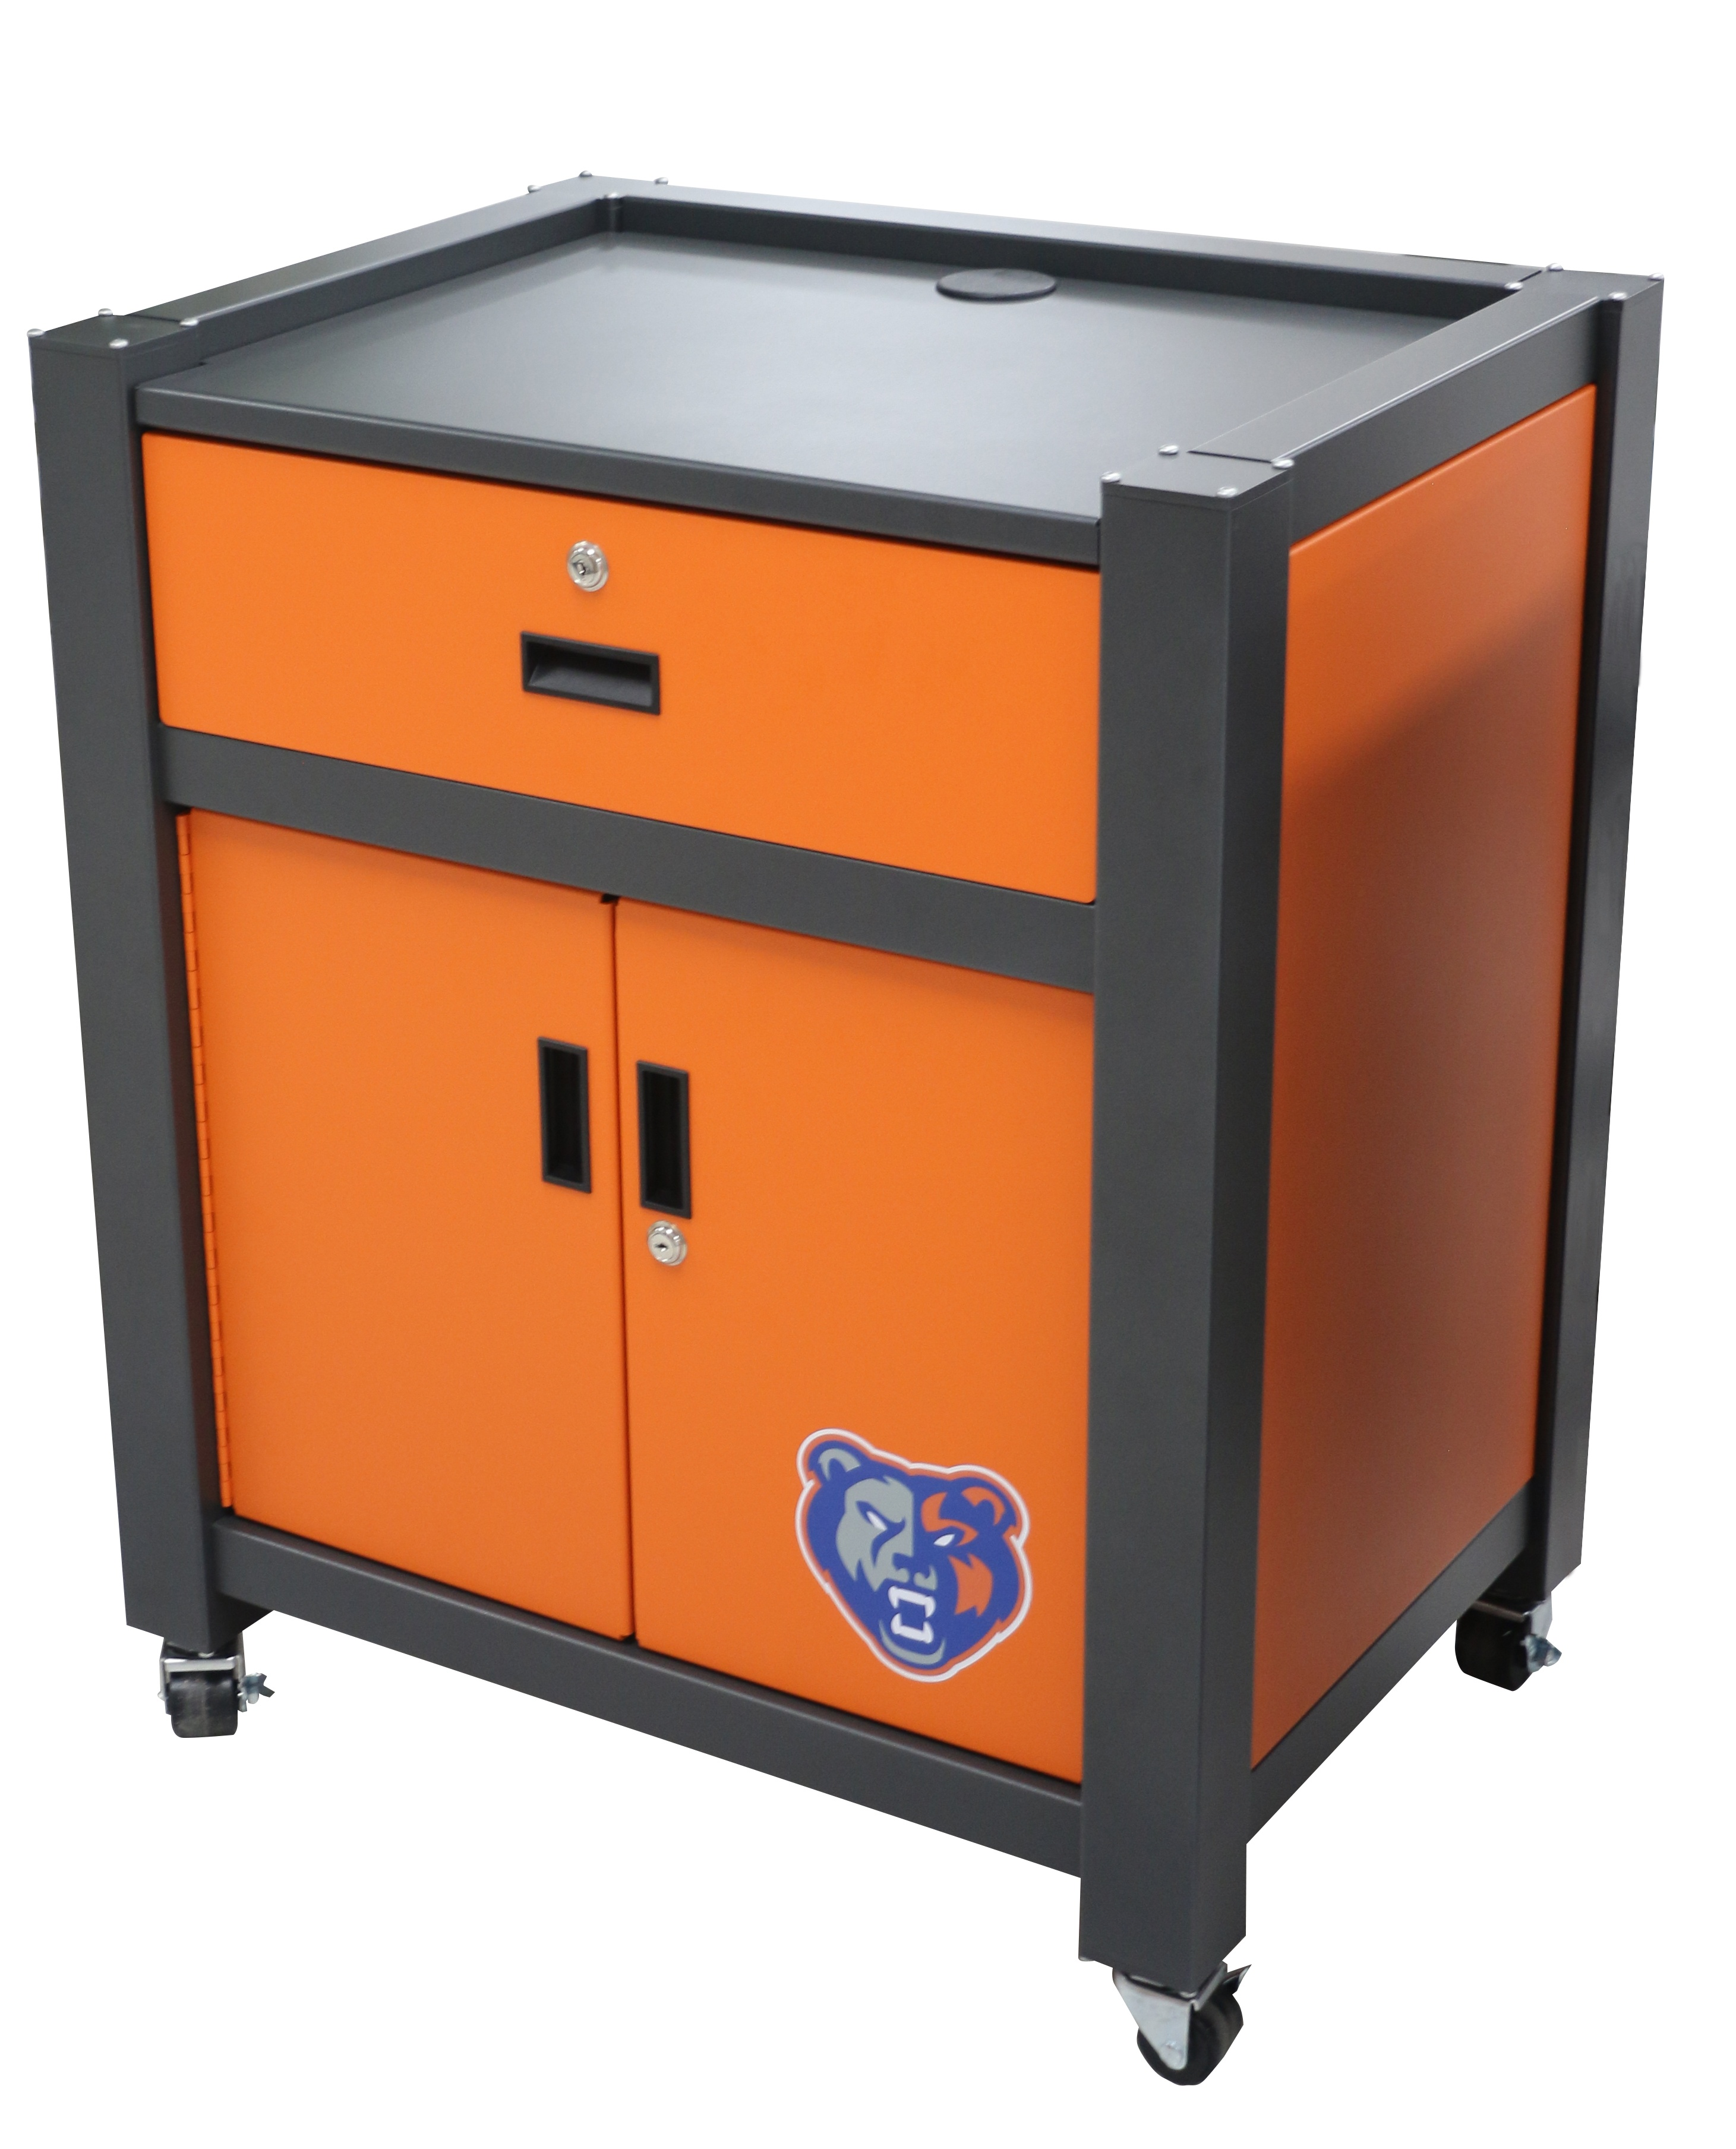 Grand Oaks HS-(Modality Cart